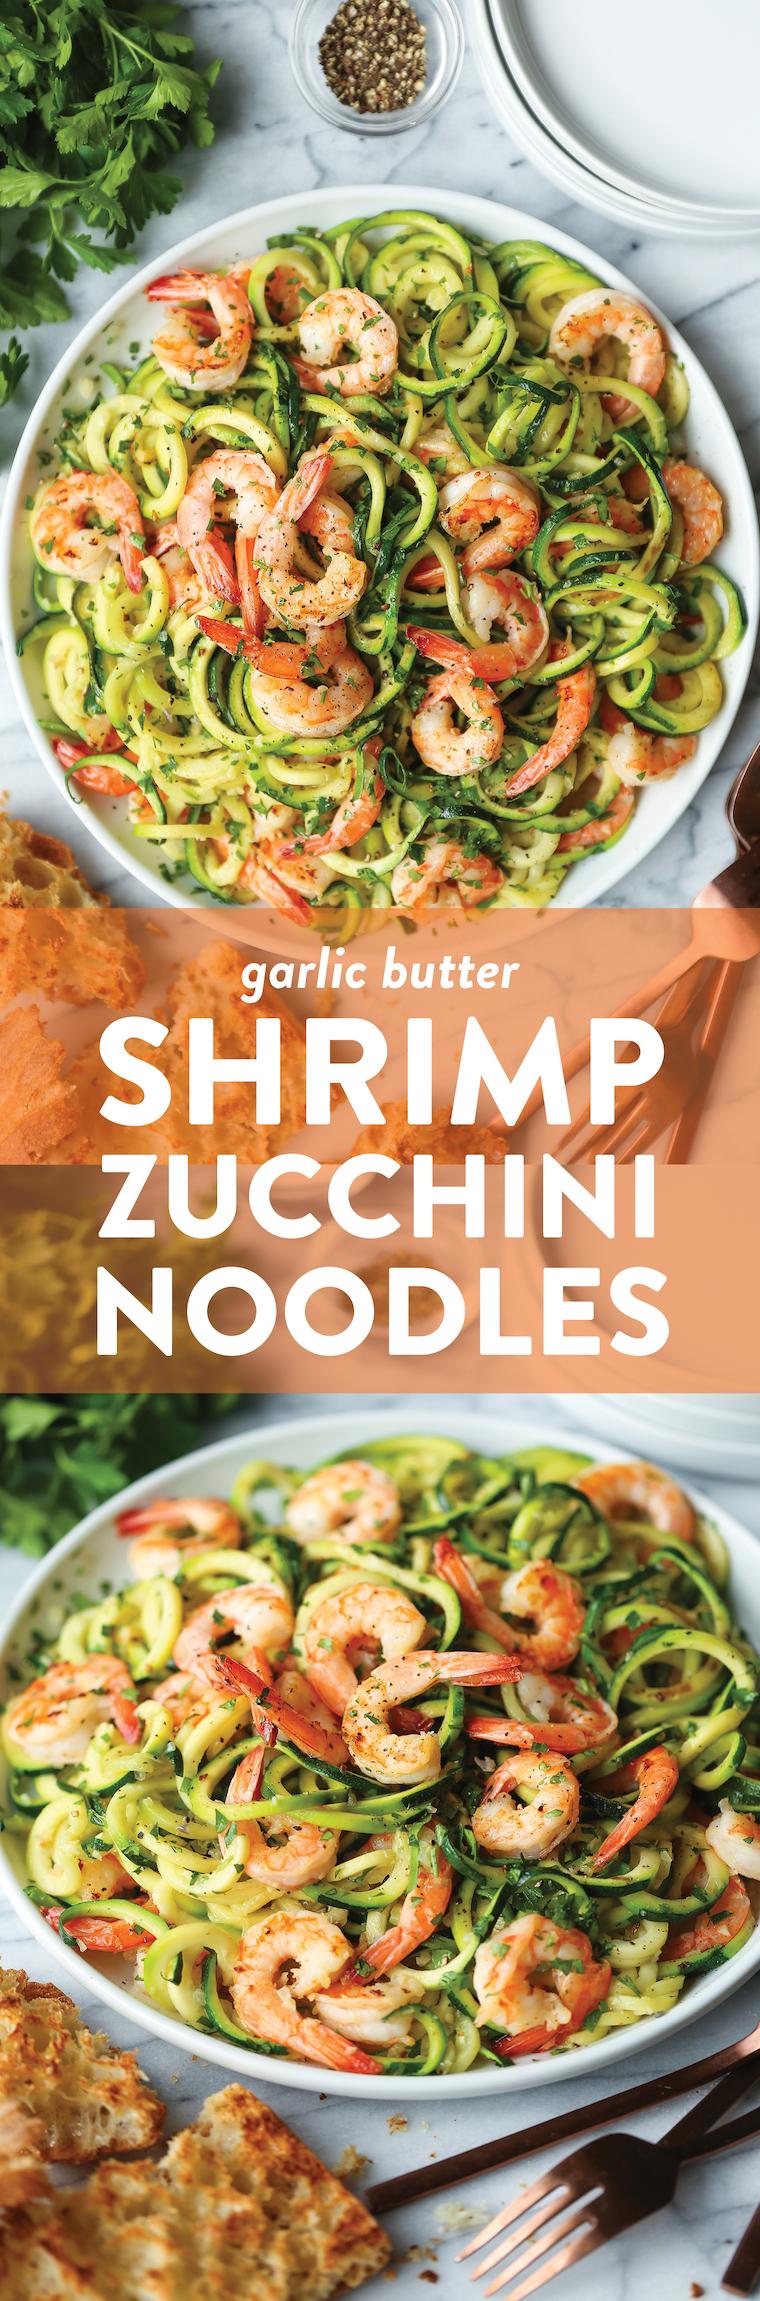 Garlic Butter Shrimp Zucchini Noodles